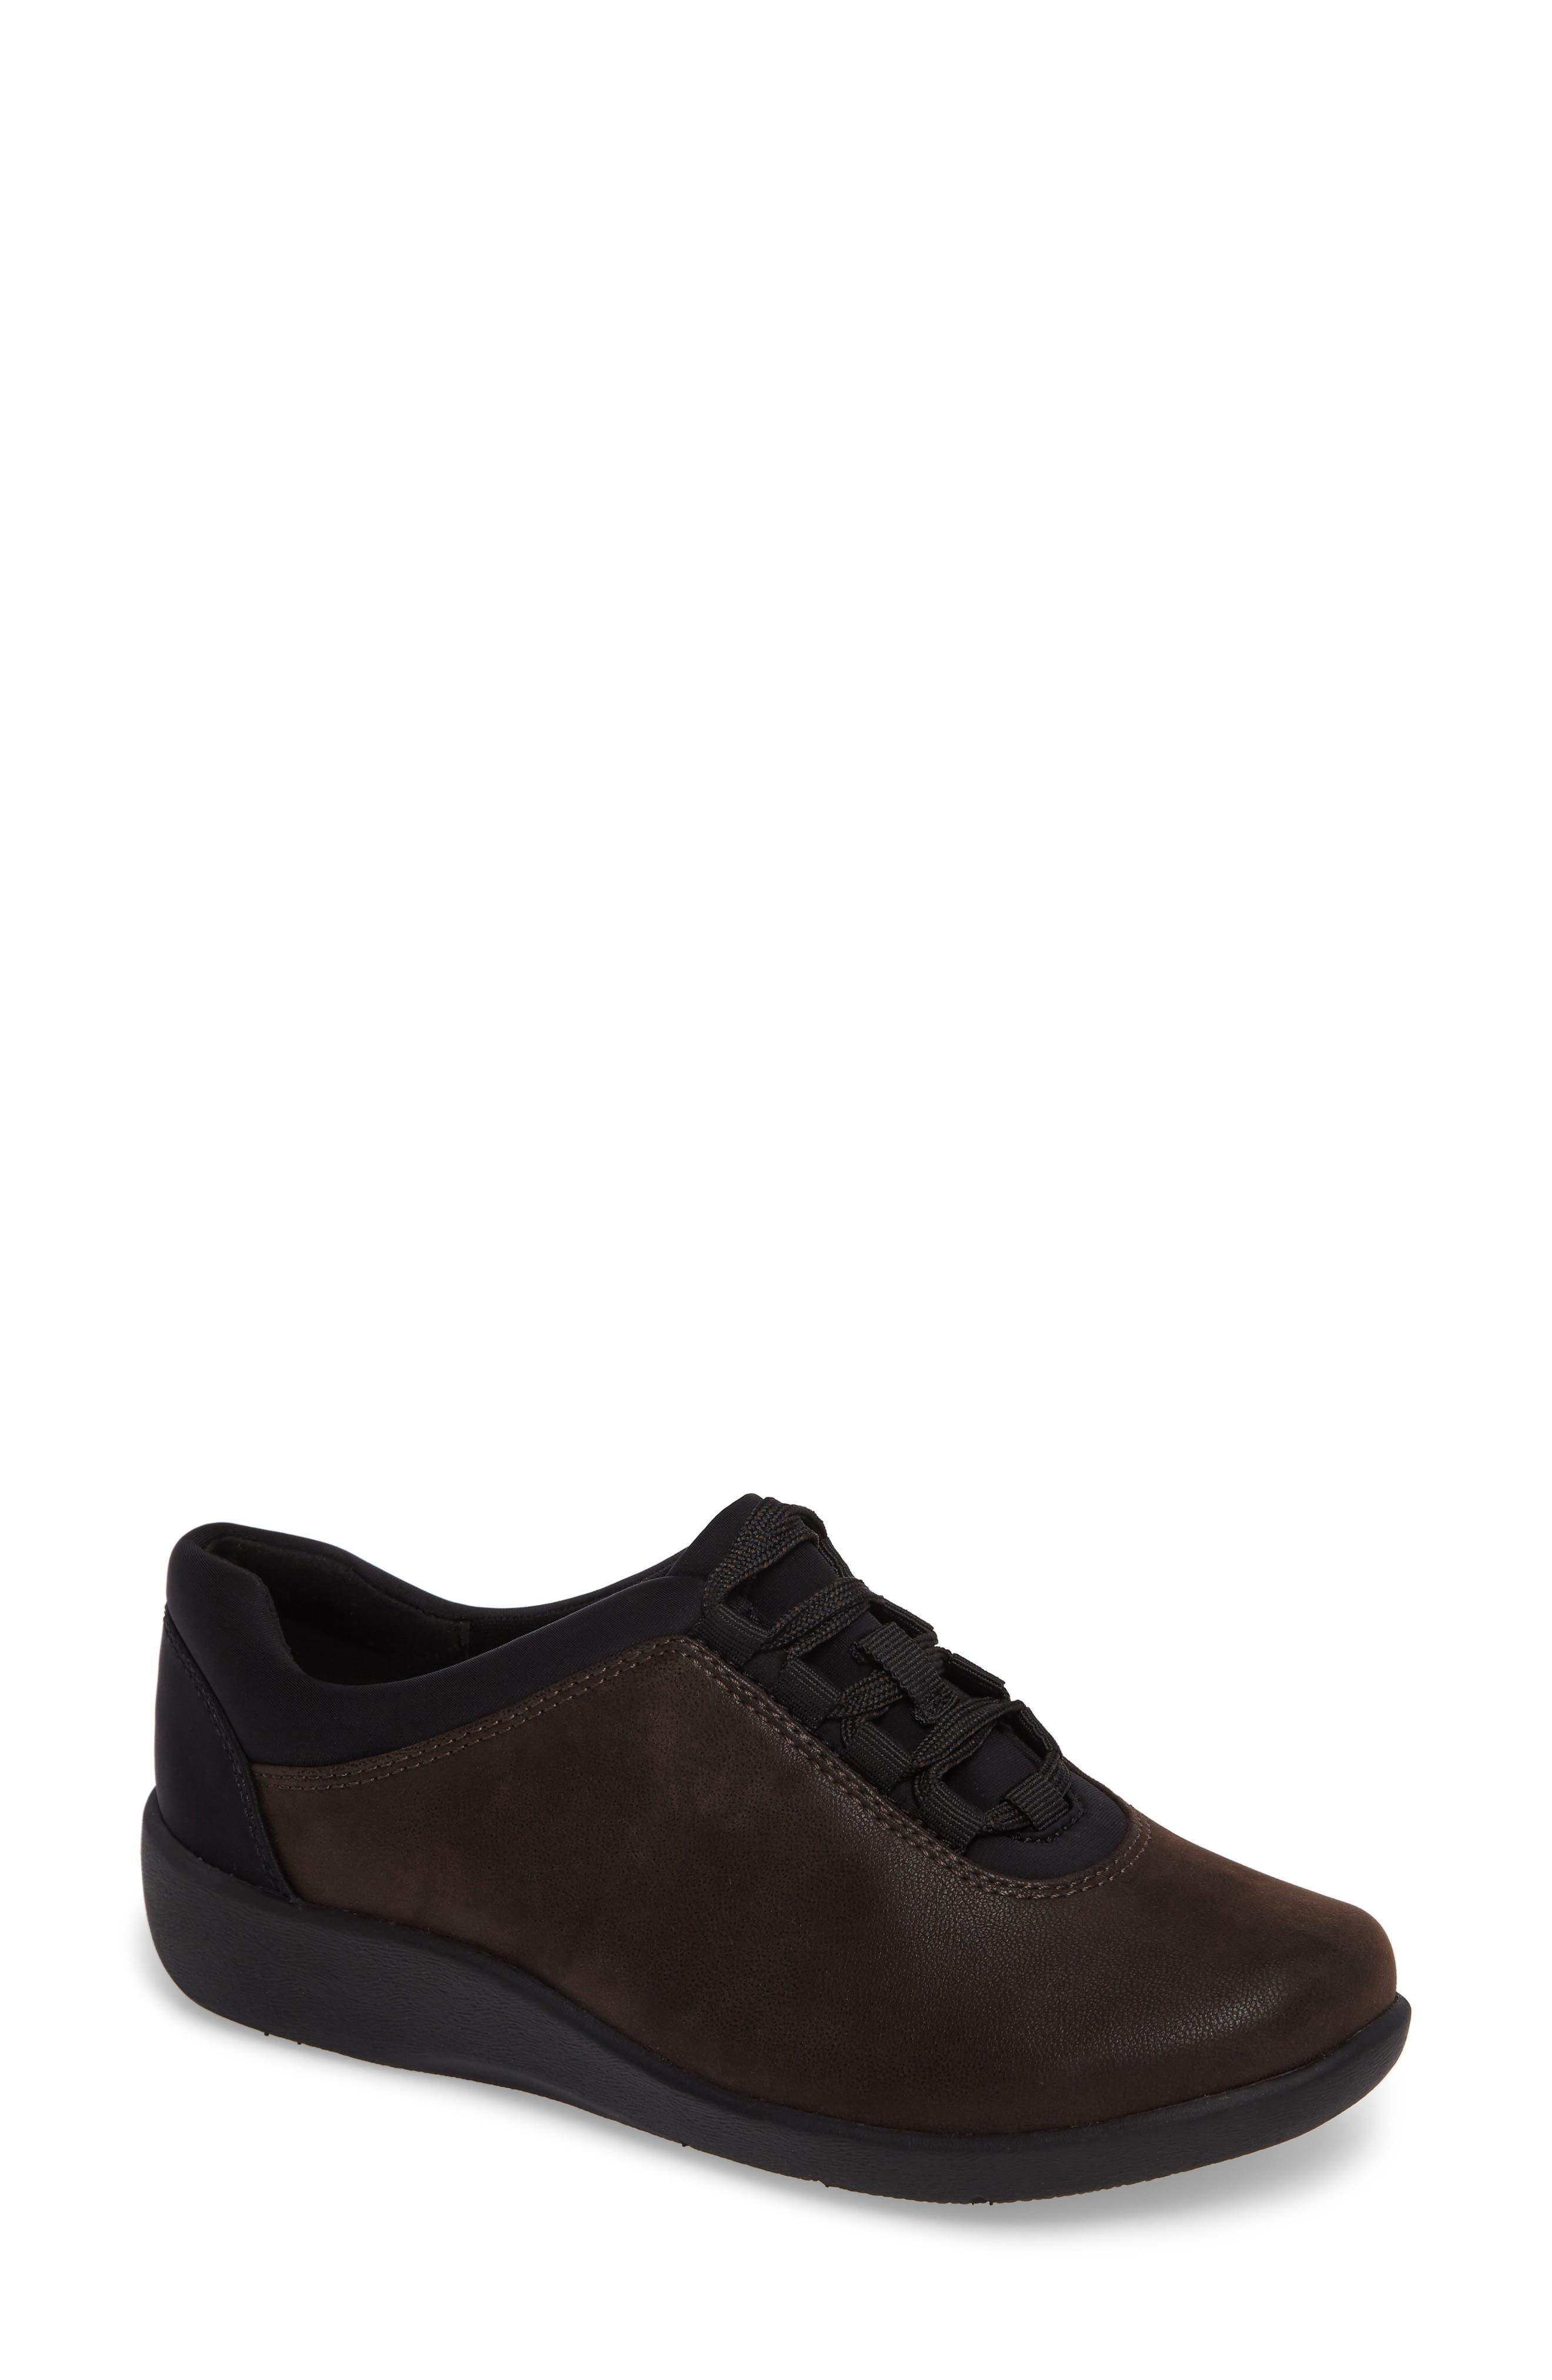 Sillian Pine Sneaker,                         Main,                         color, Brown Canvas